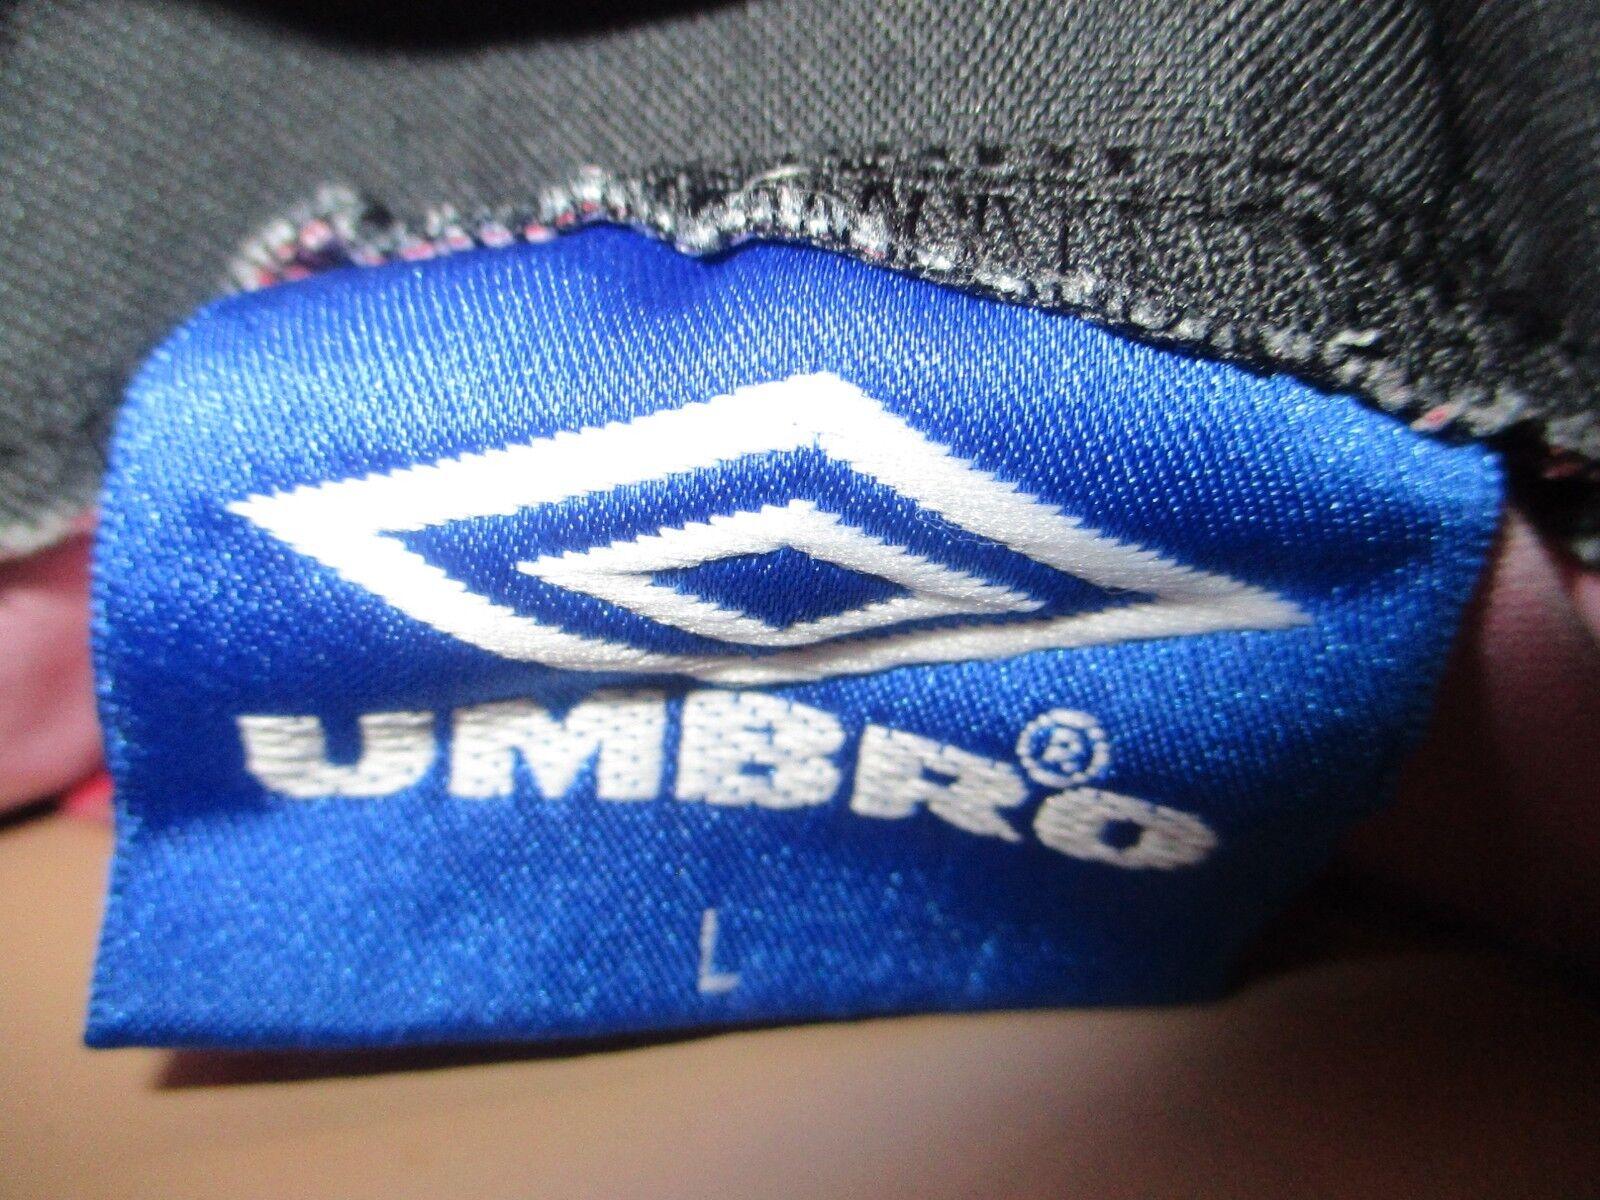 Manchester 1996/97 United Original umbro Heim Trikot 1996/97 Manchester